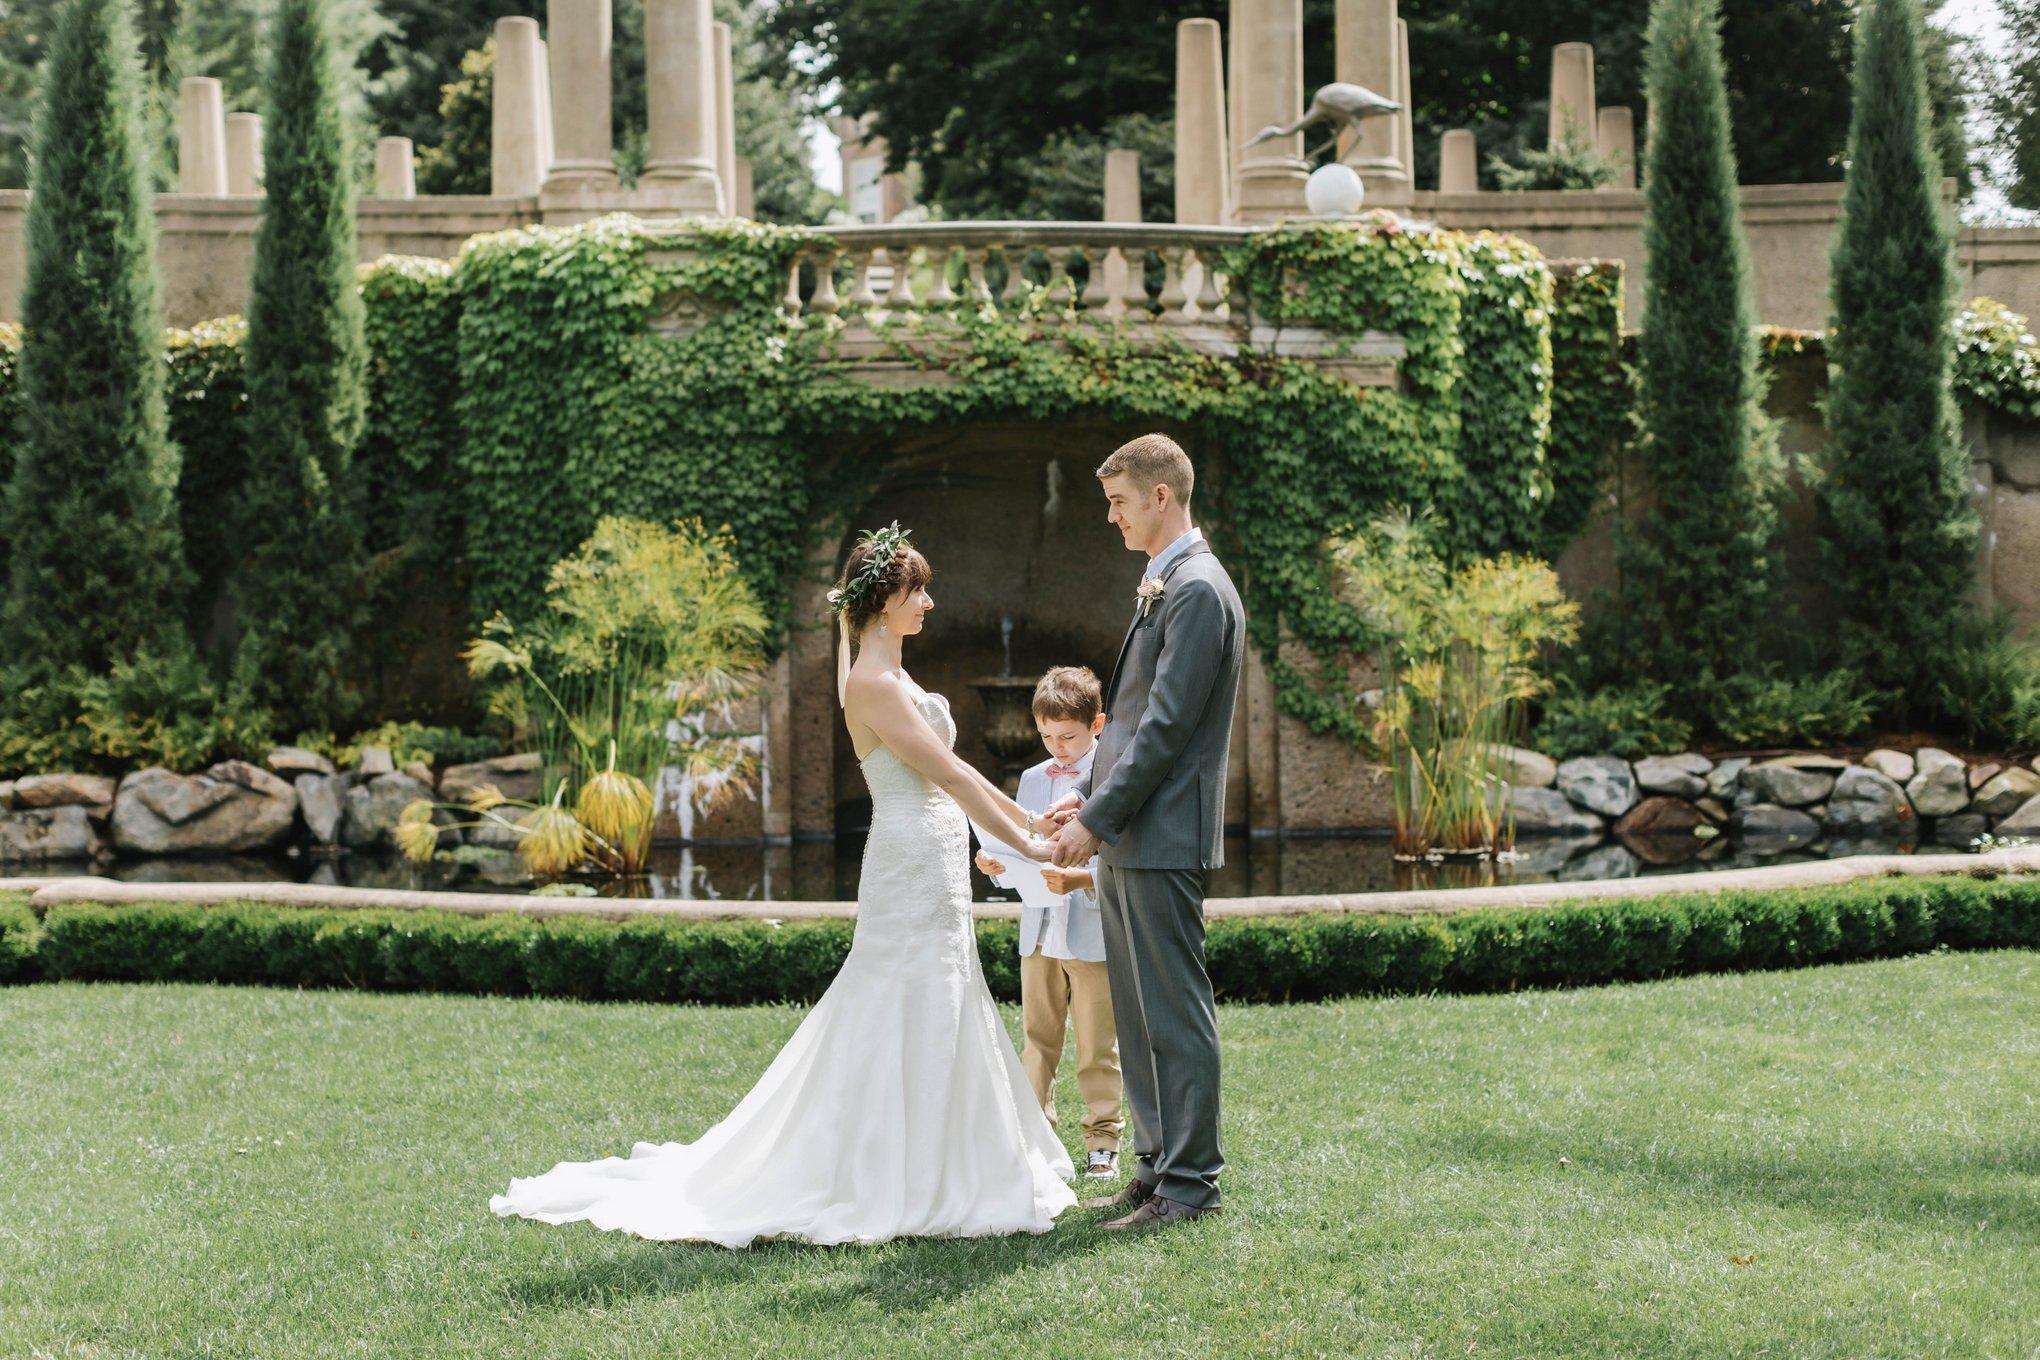 Crane-Estate-Vow-Renewal-Wedding-3.JPG